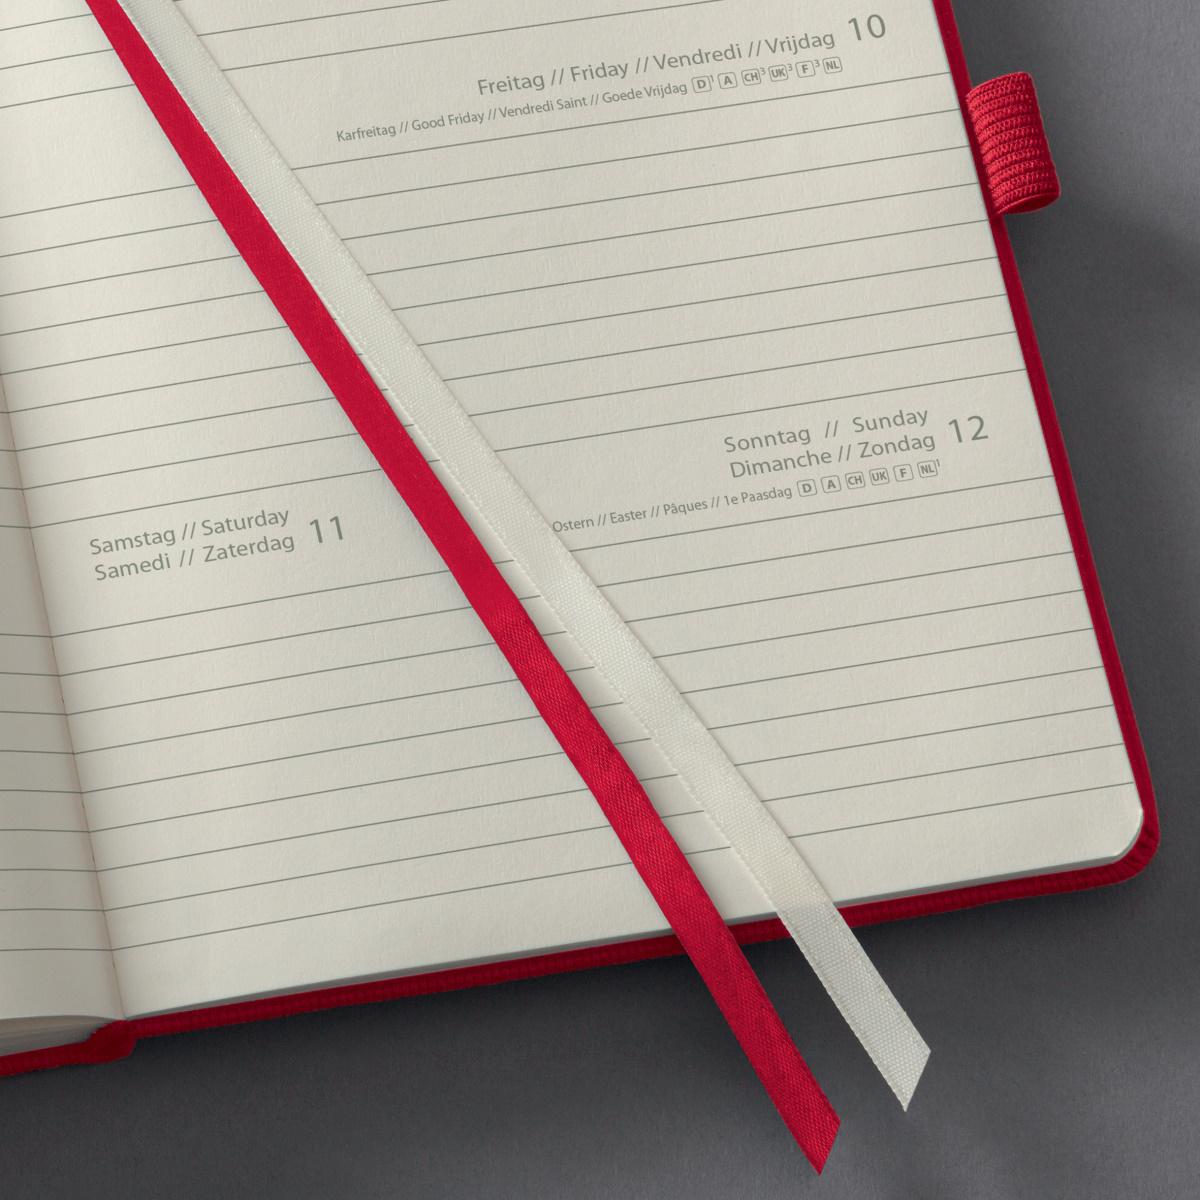 SIGEL Wochenkalender Conceptum 2020 ca.A5 Hardcover red C2064